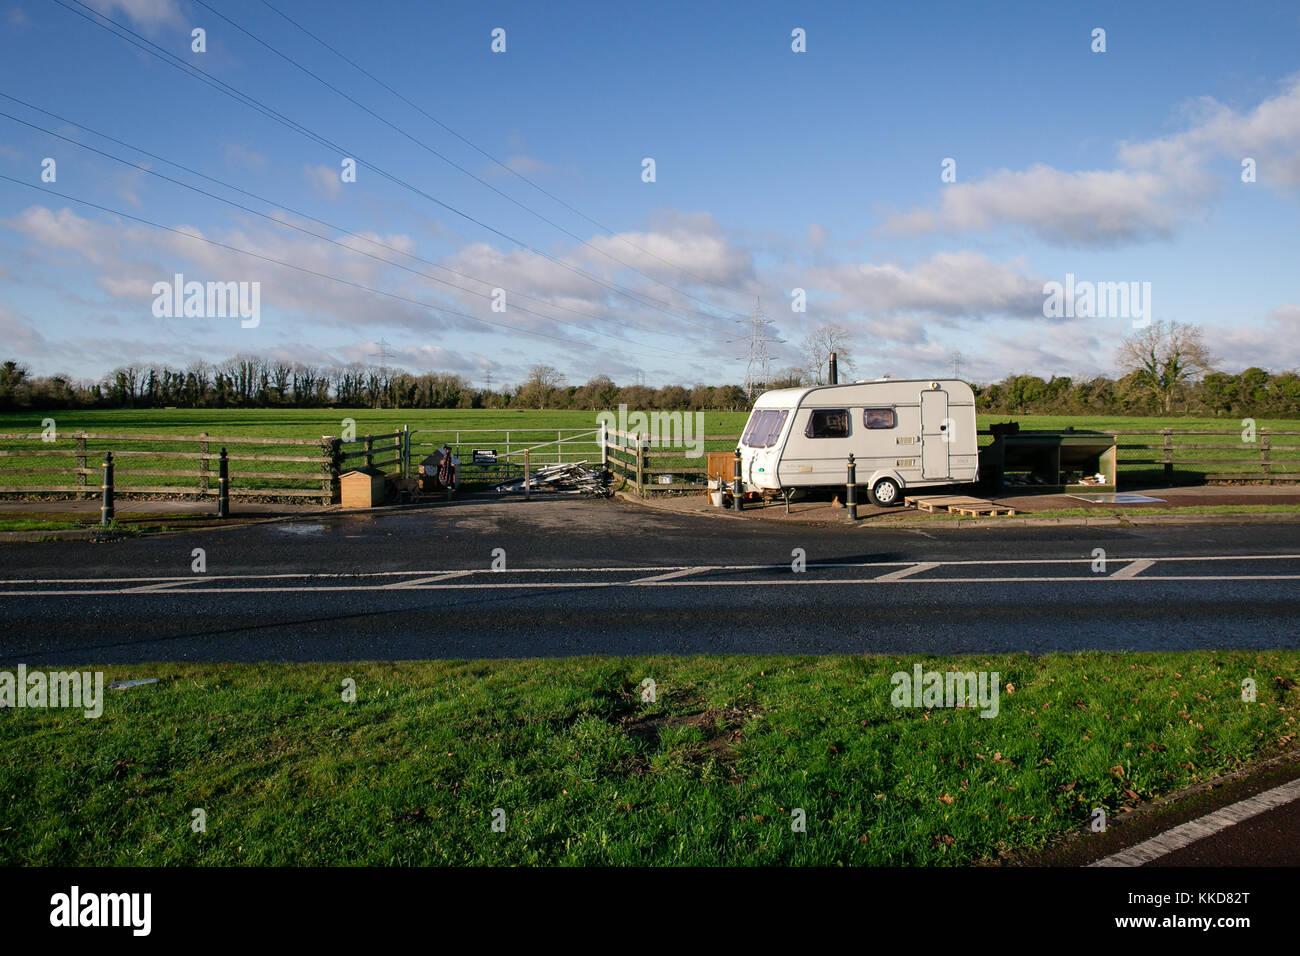 Celbridge, Ireland. 29 Nov, 2017: Irish Travellers settling in in Celbridge. Caravan parked on the side of the road Stock Photo